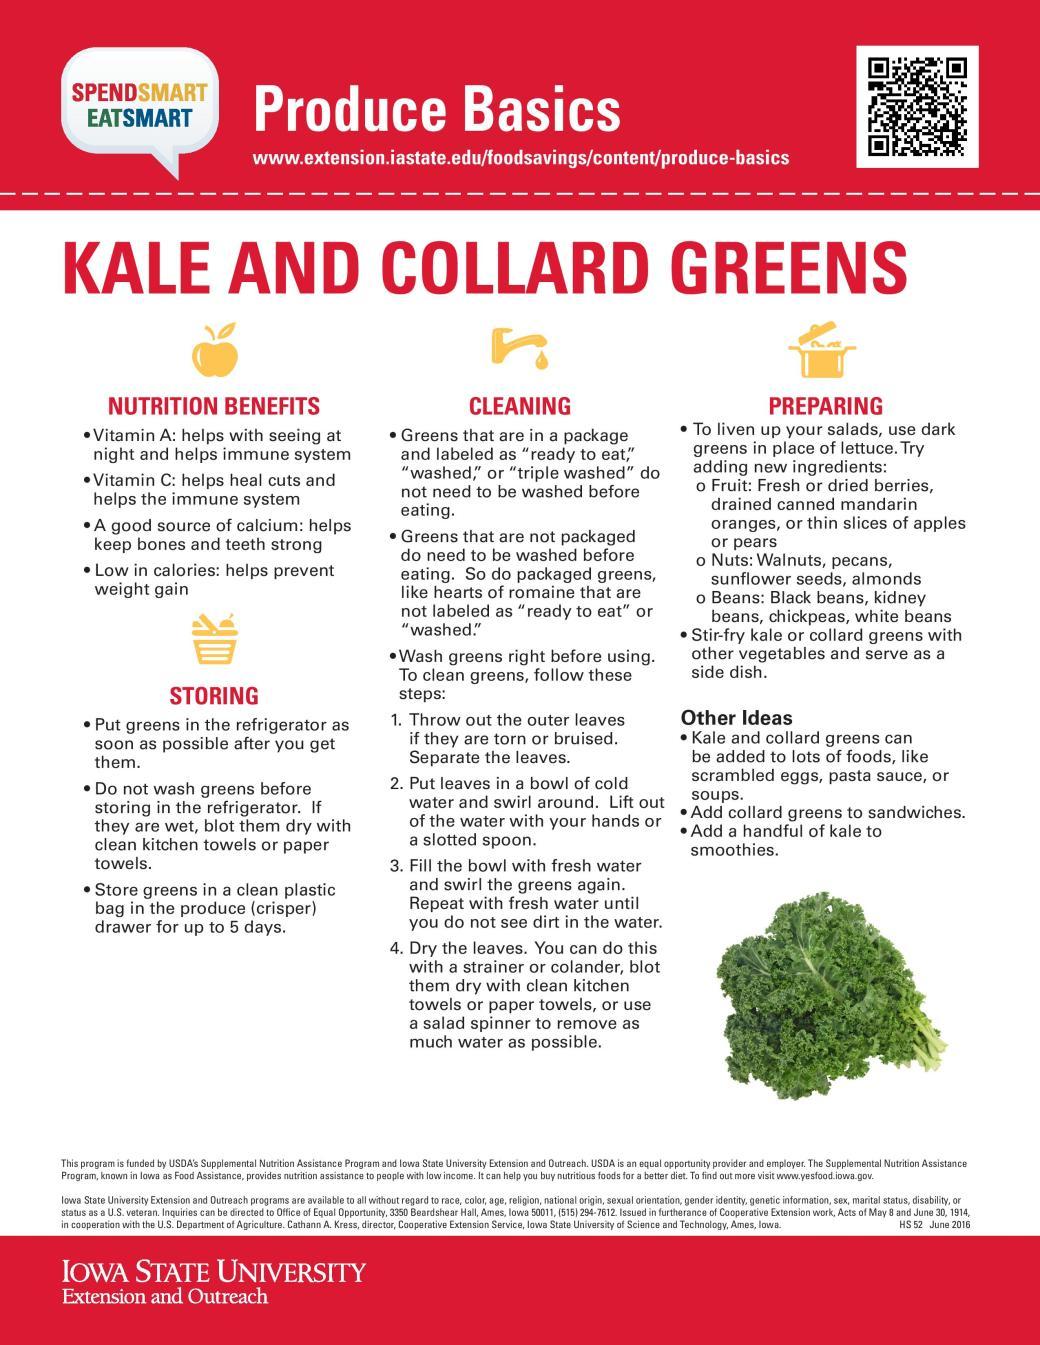 Produce-Basics-Kale-and-Collard-Greens-page-001.jpg